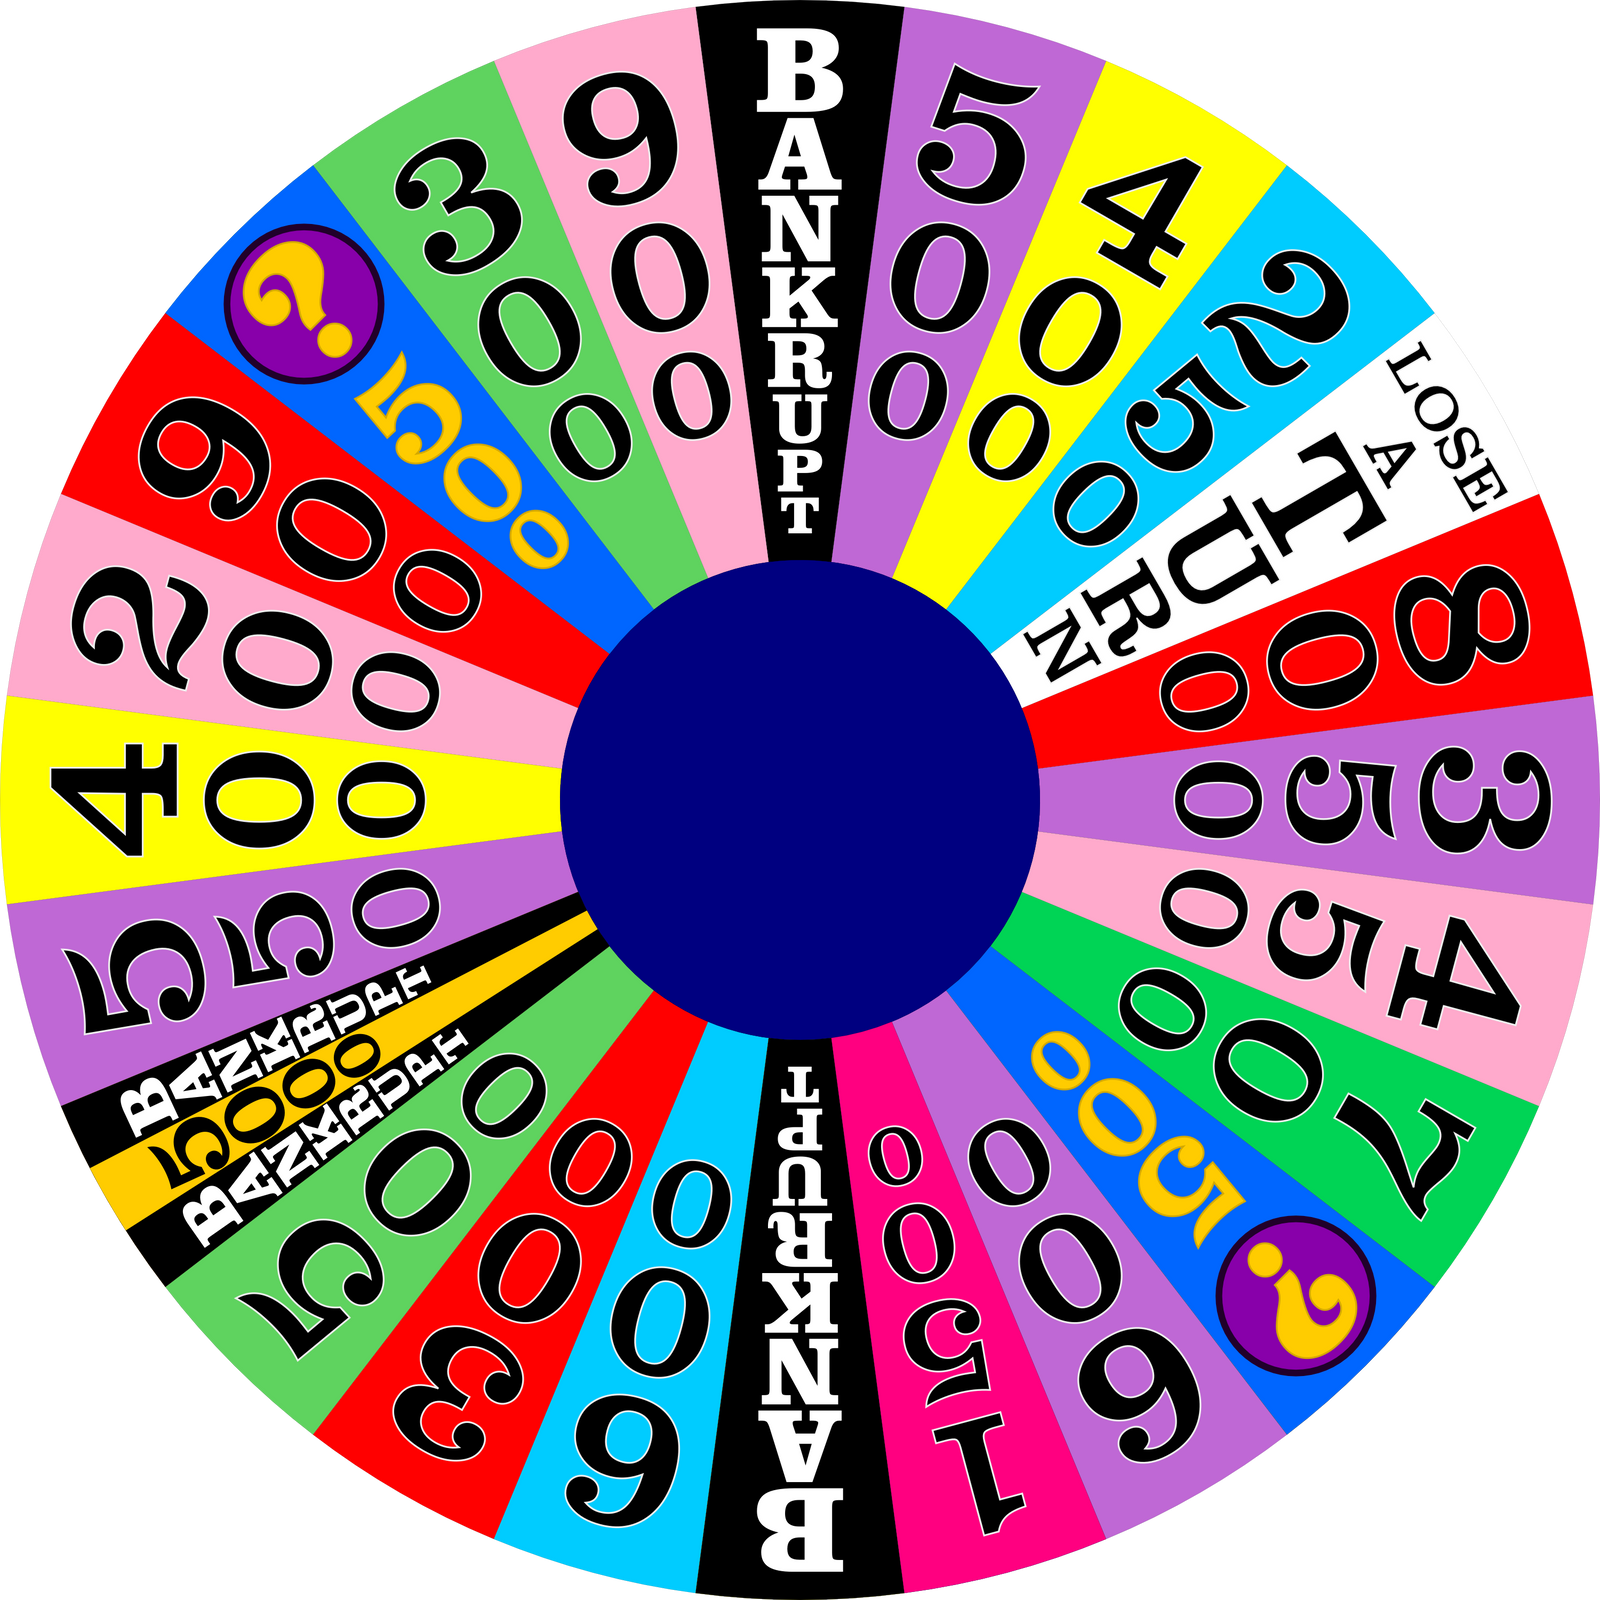 Adrian's Wheel of Fortune R3 by peterscrambler on DeviantArt